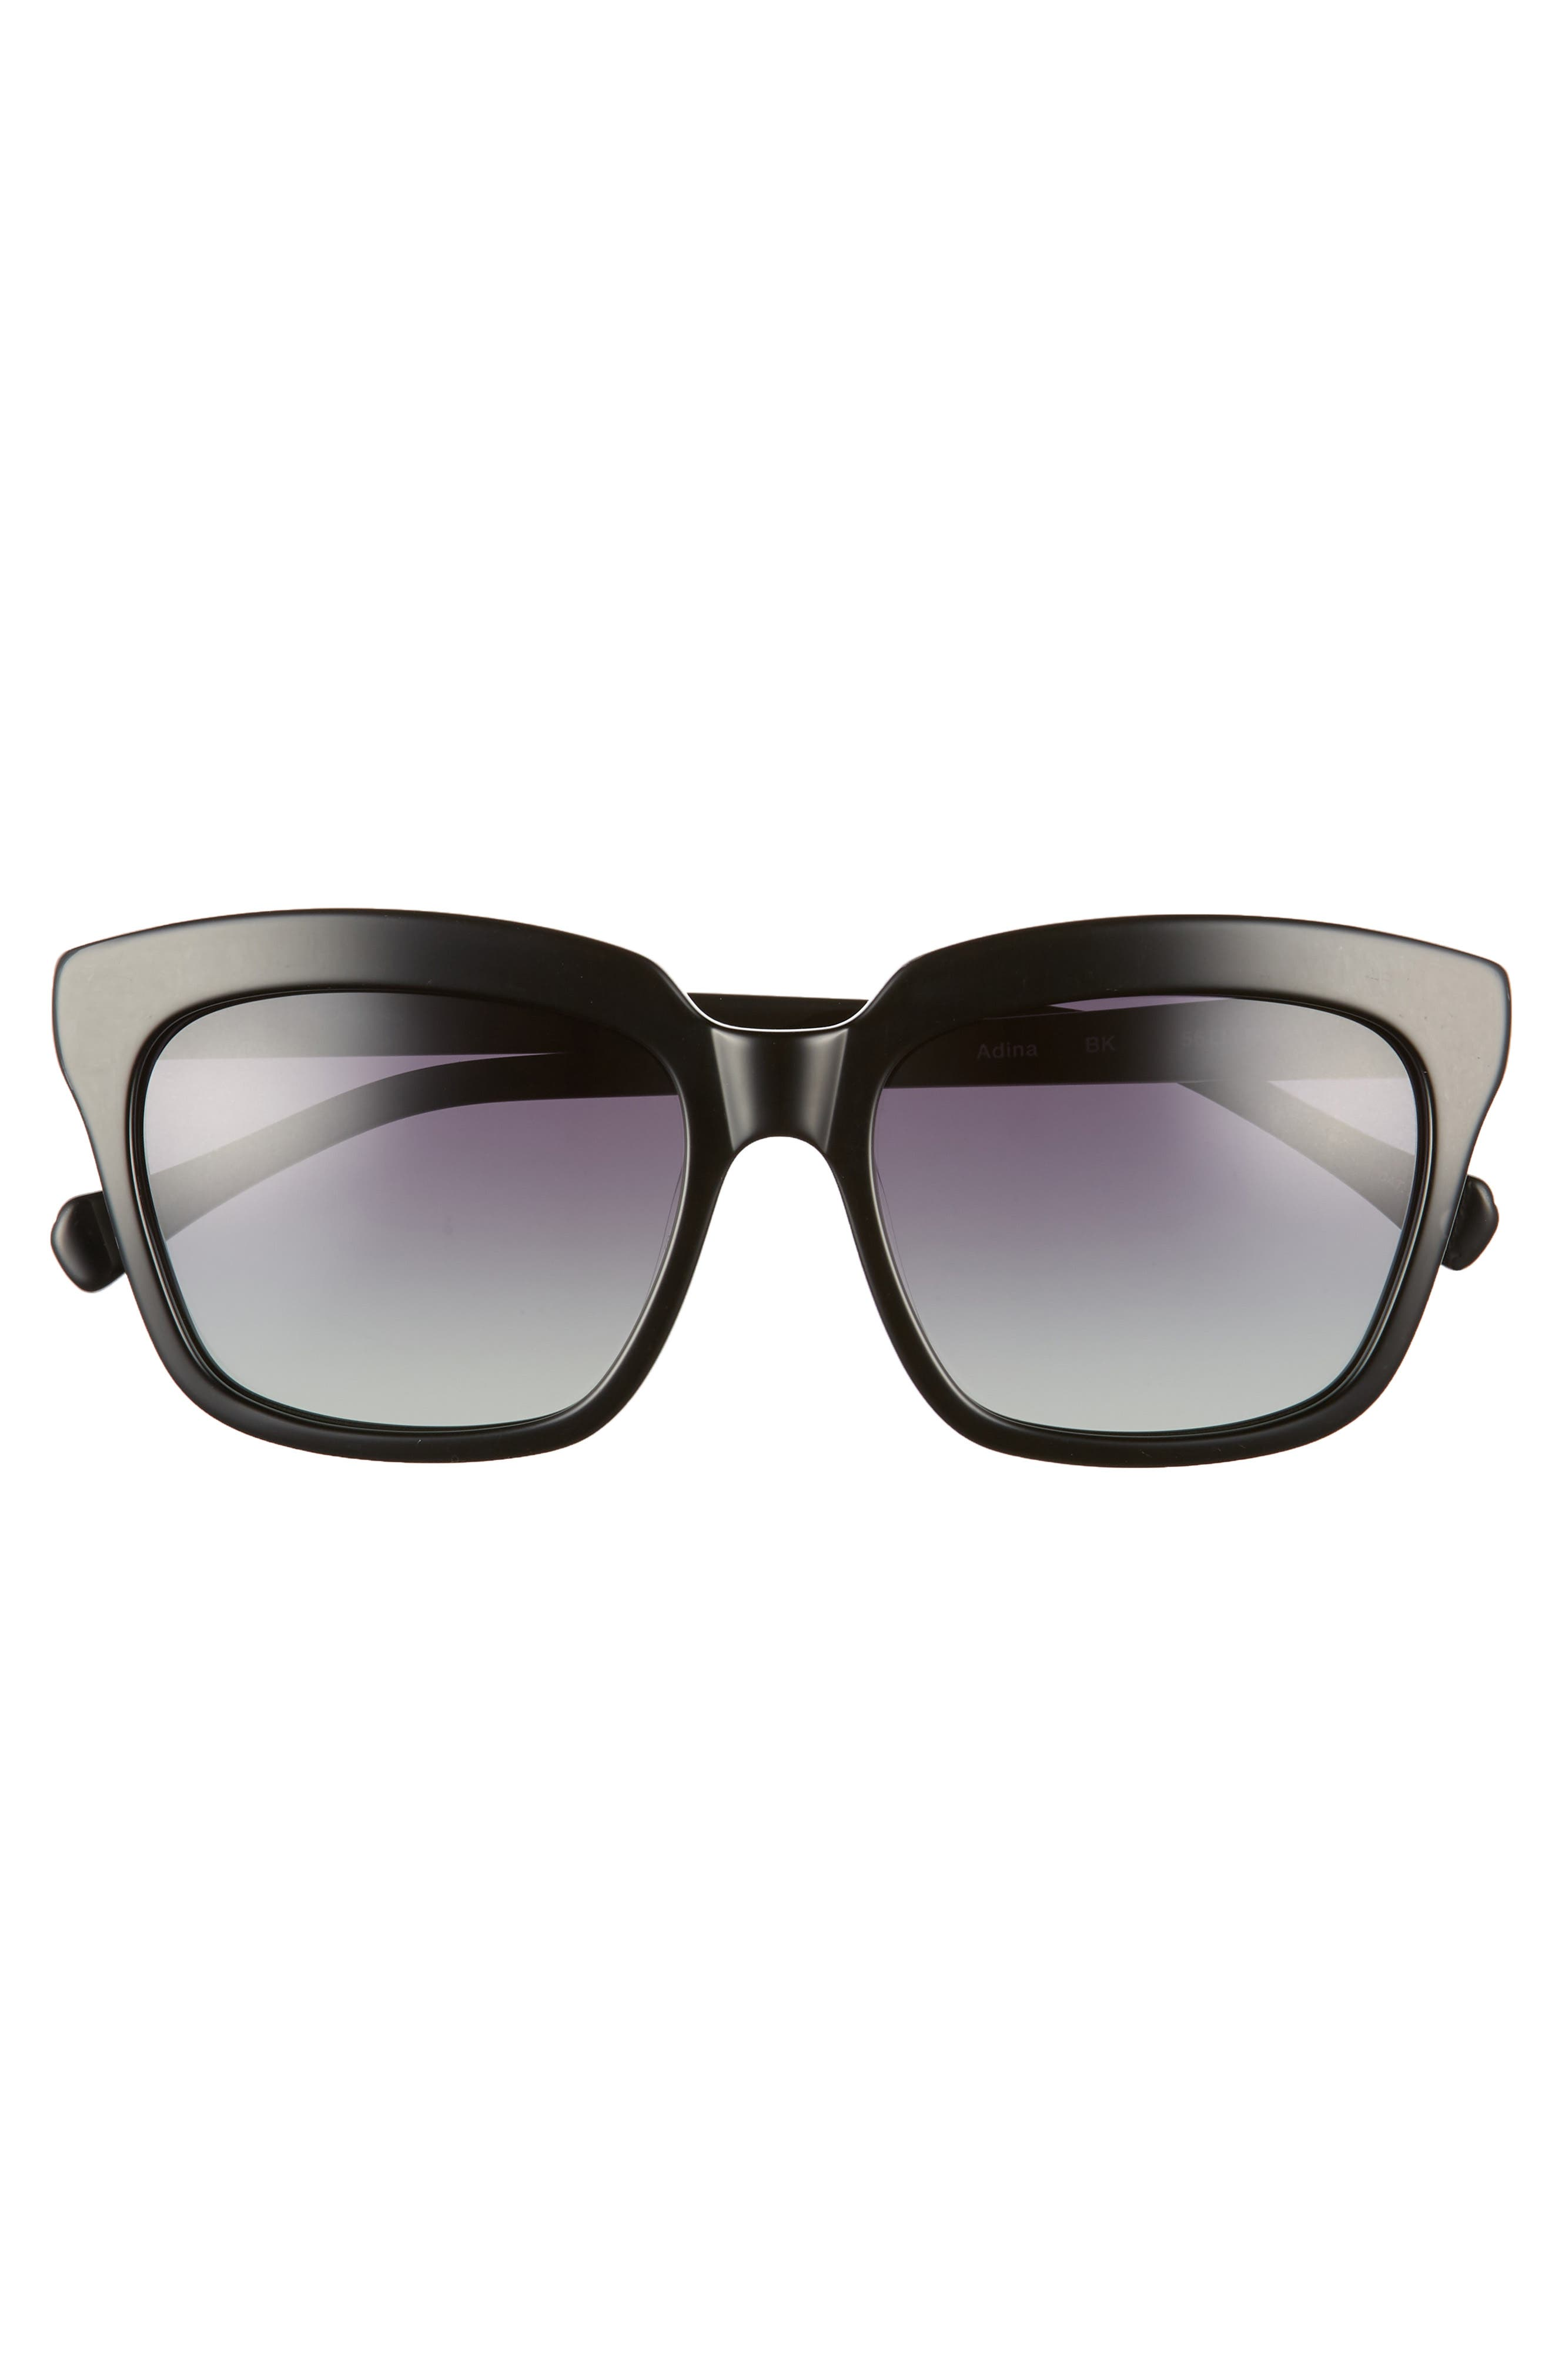 Adina 56mm Polarized Sunglasses,                             Alternate thumbnail 3, color,                             001